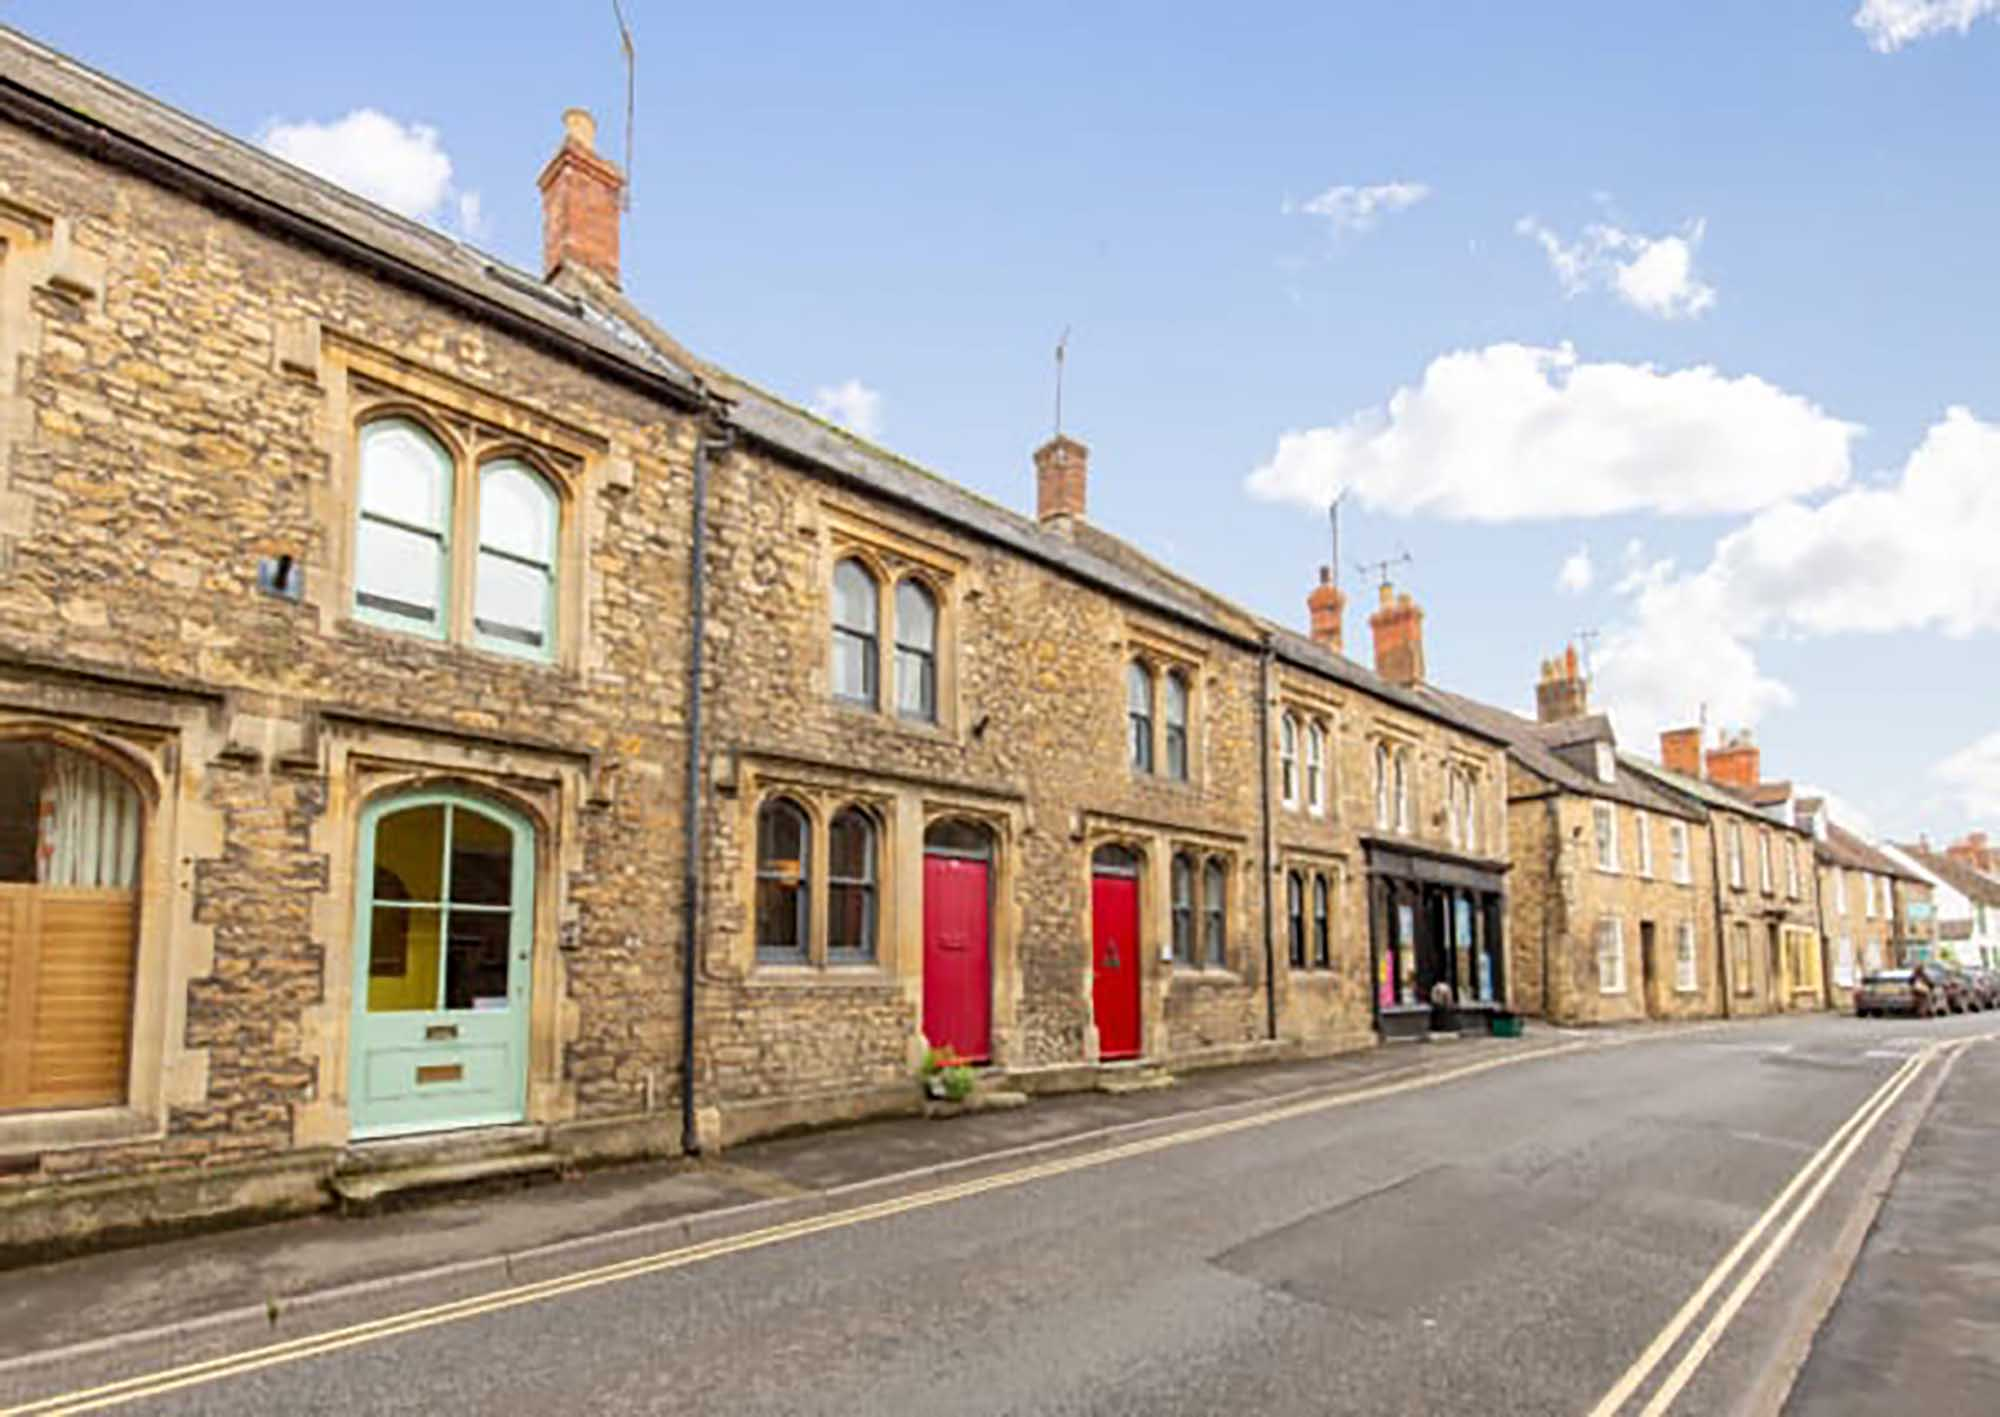 Pretty town house in Bruton High Street